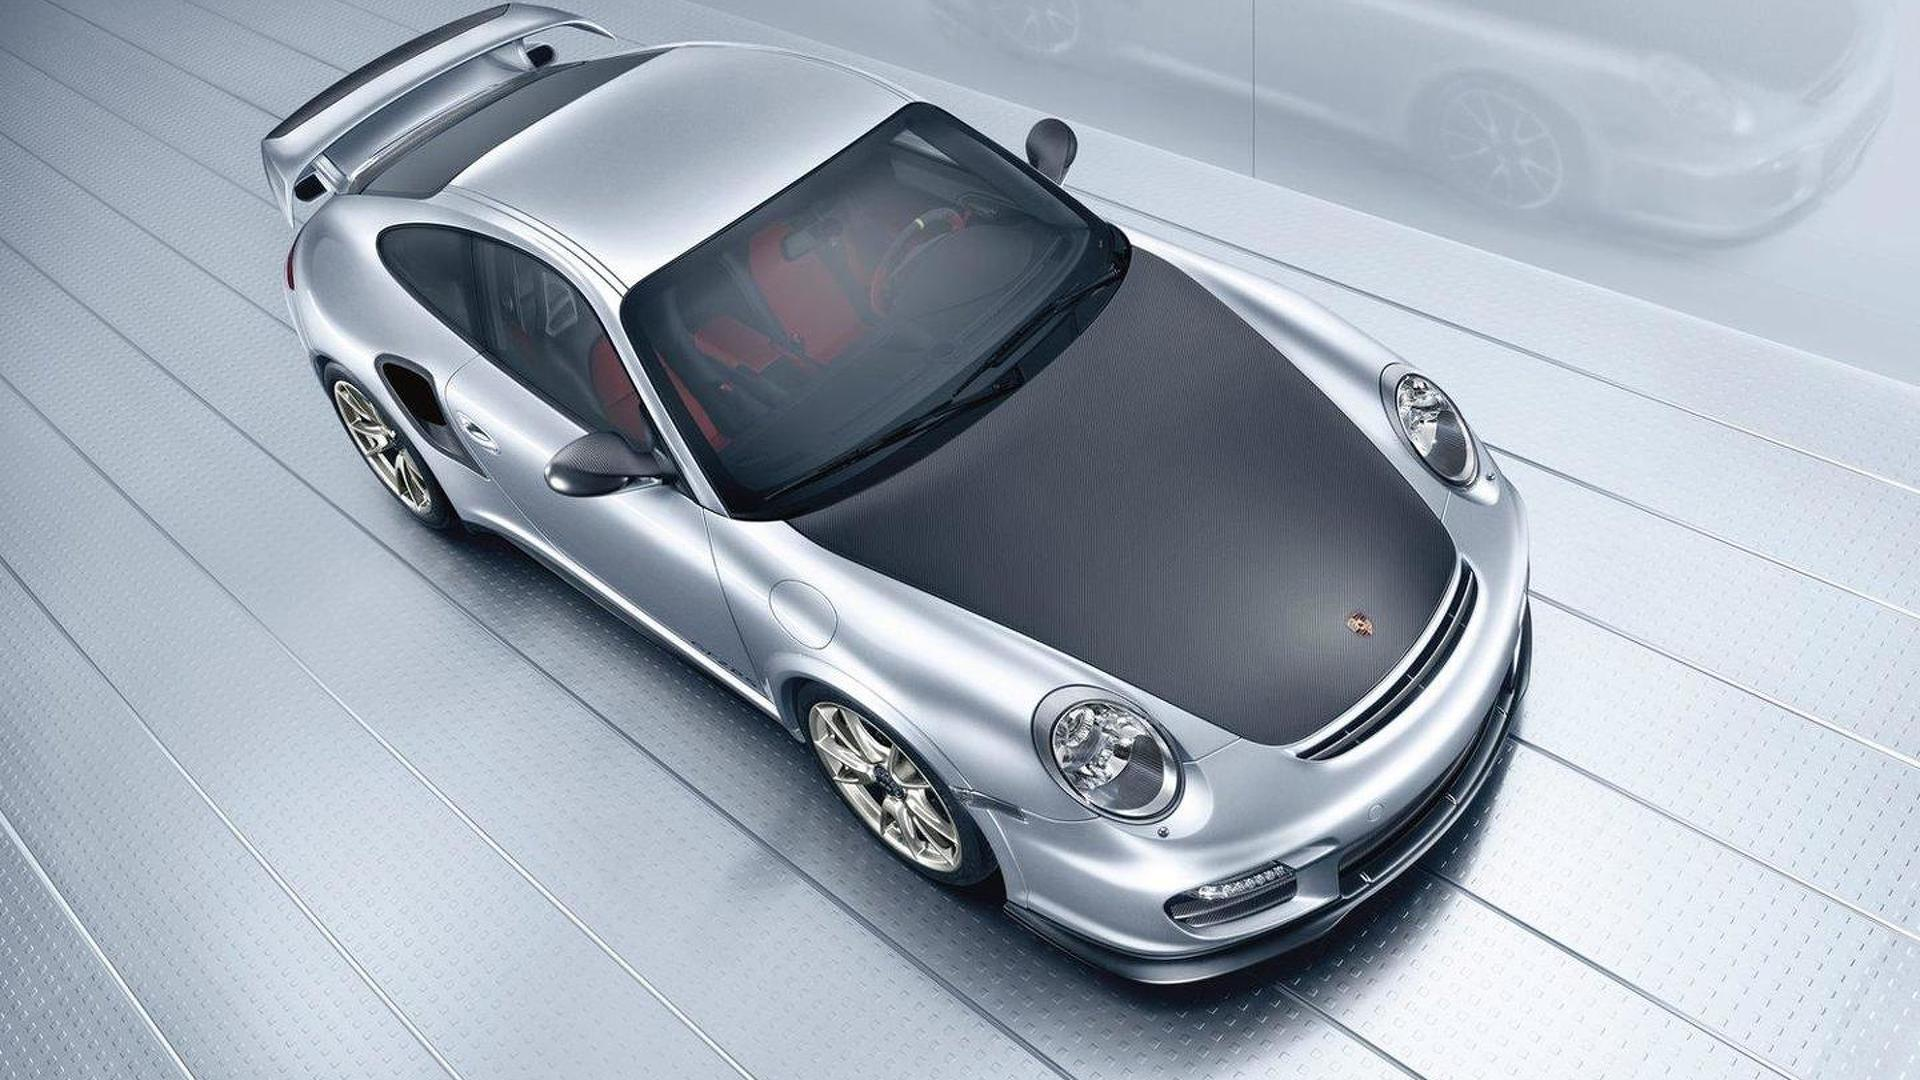 2010-253319-2011-porsche-911-gt2-rs-first-official-photos-12-05-20101 Astounding Porsche 911 Gt2 for Sale Canada Cars Trend